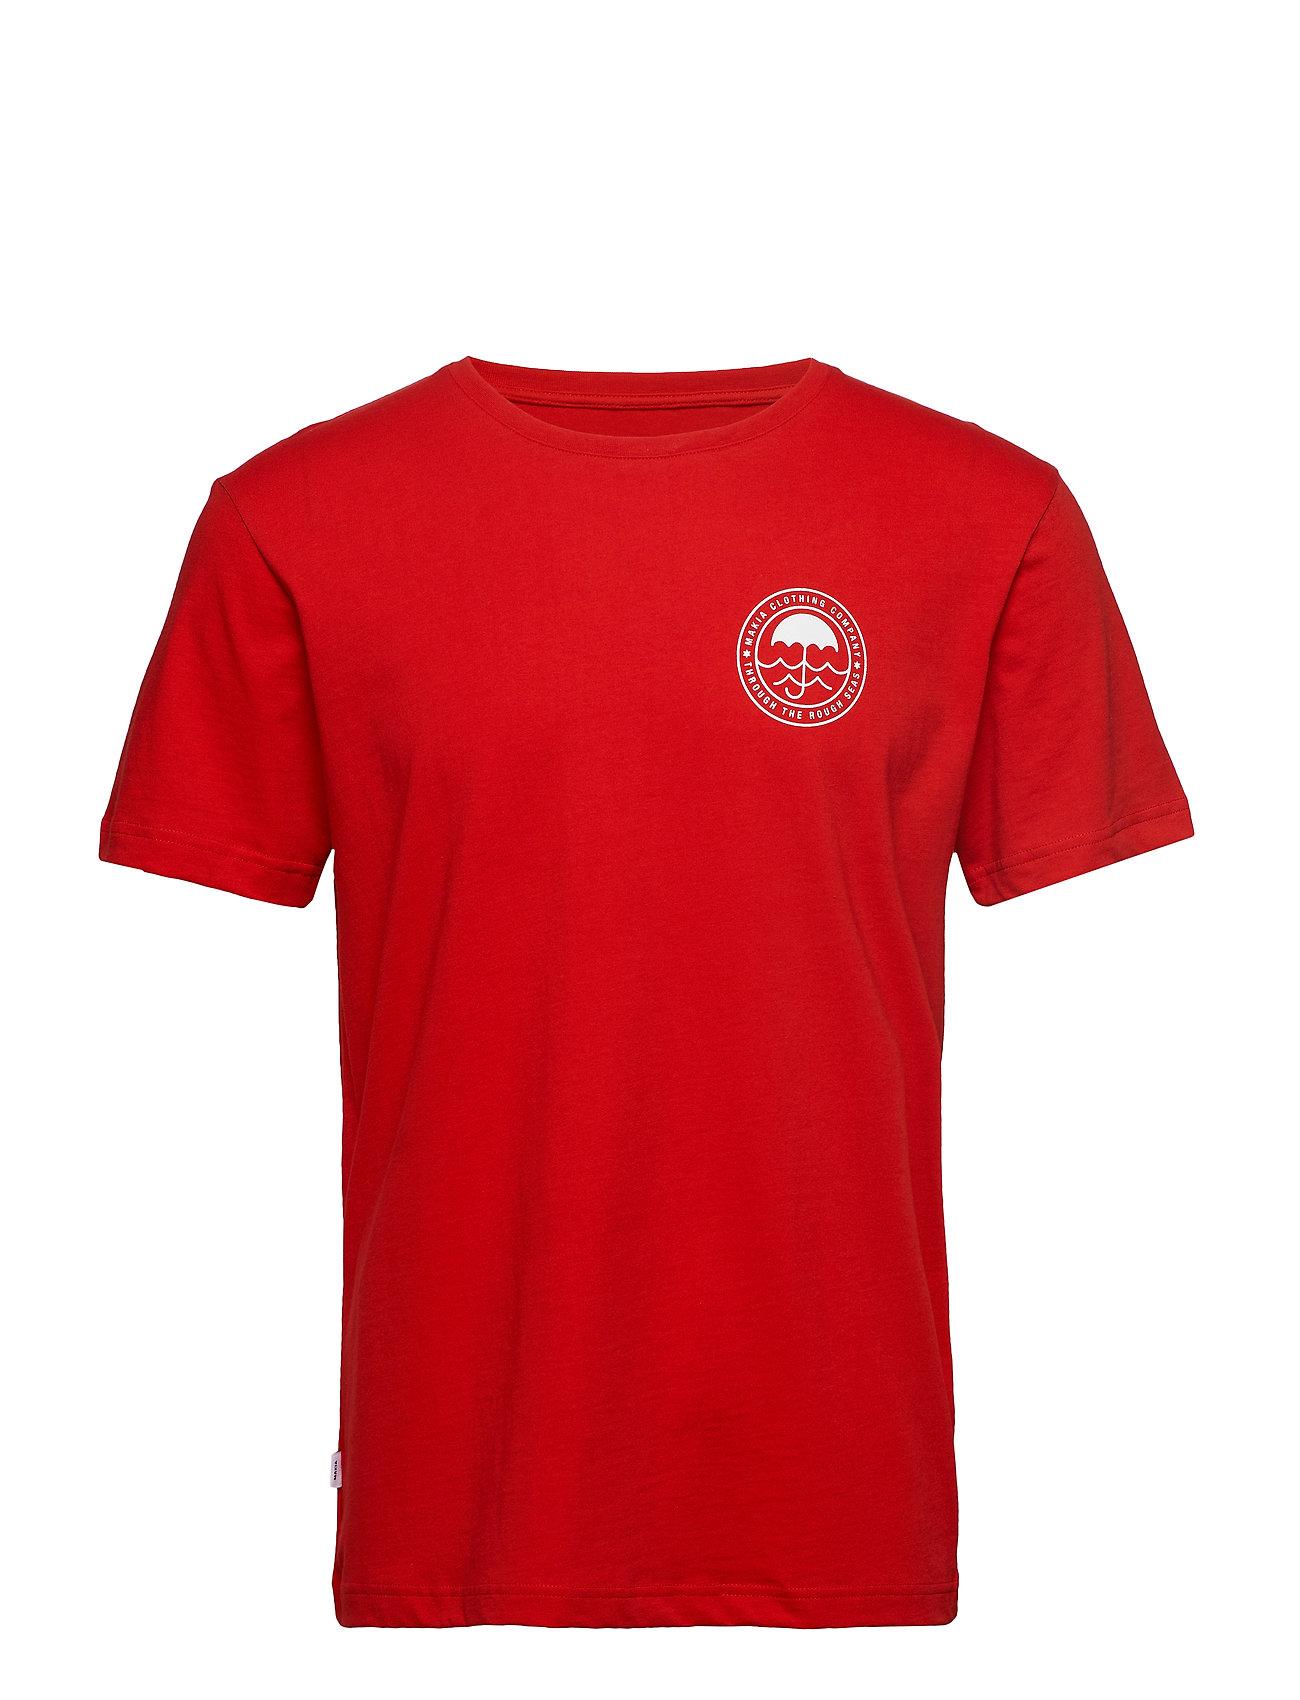 Makia Umbrella T-Shirt - RED